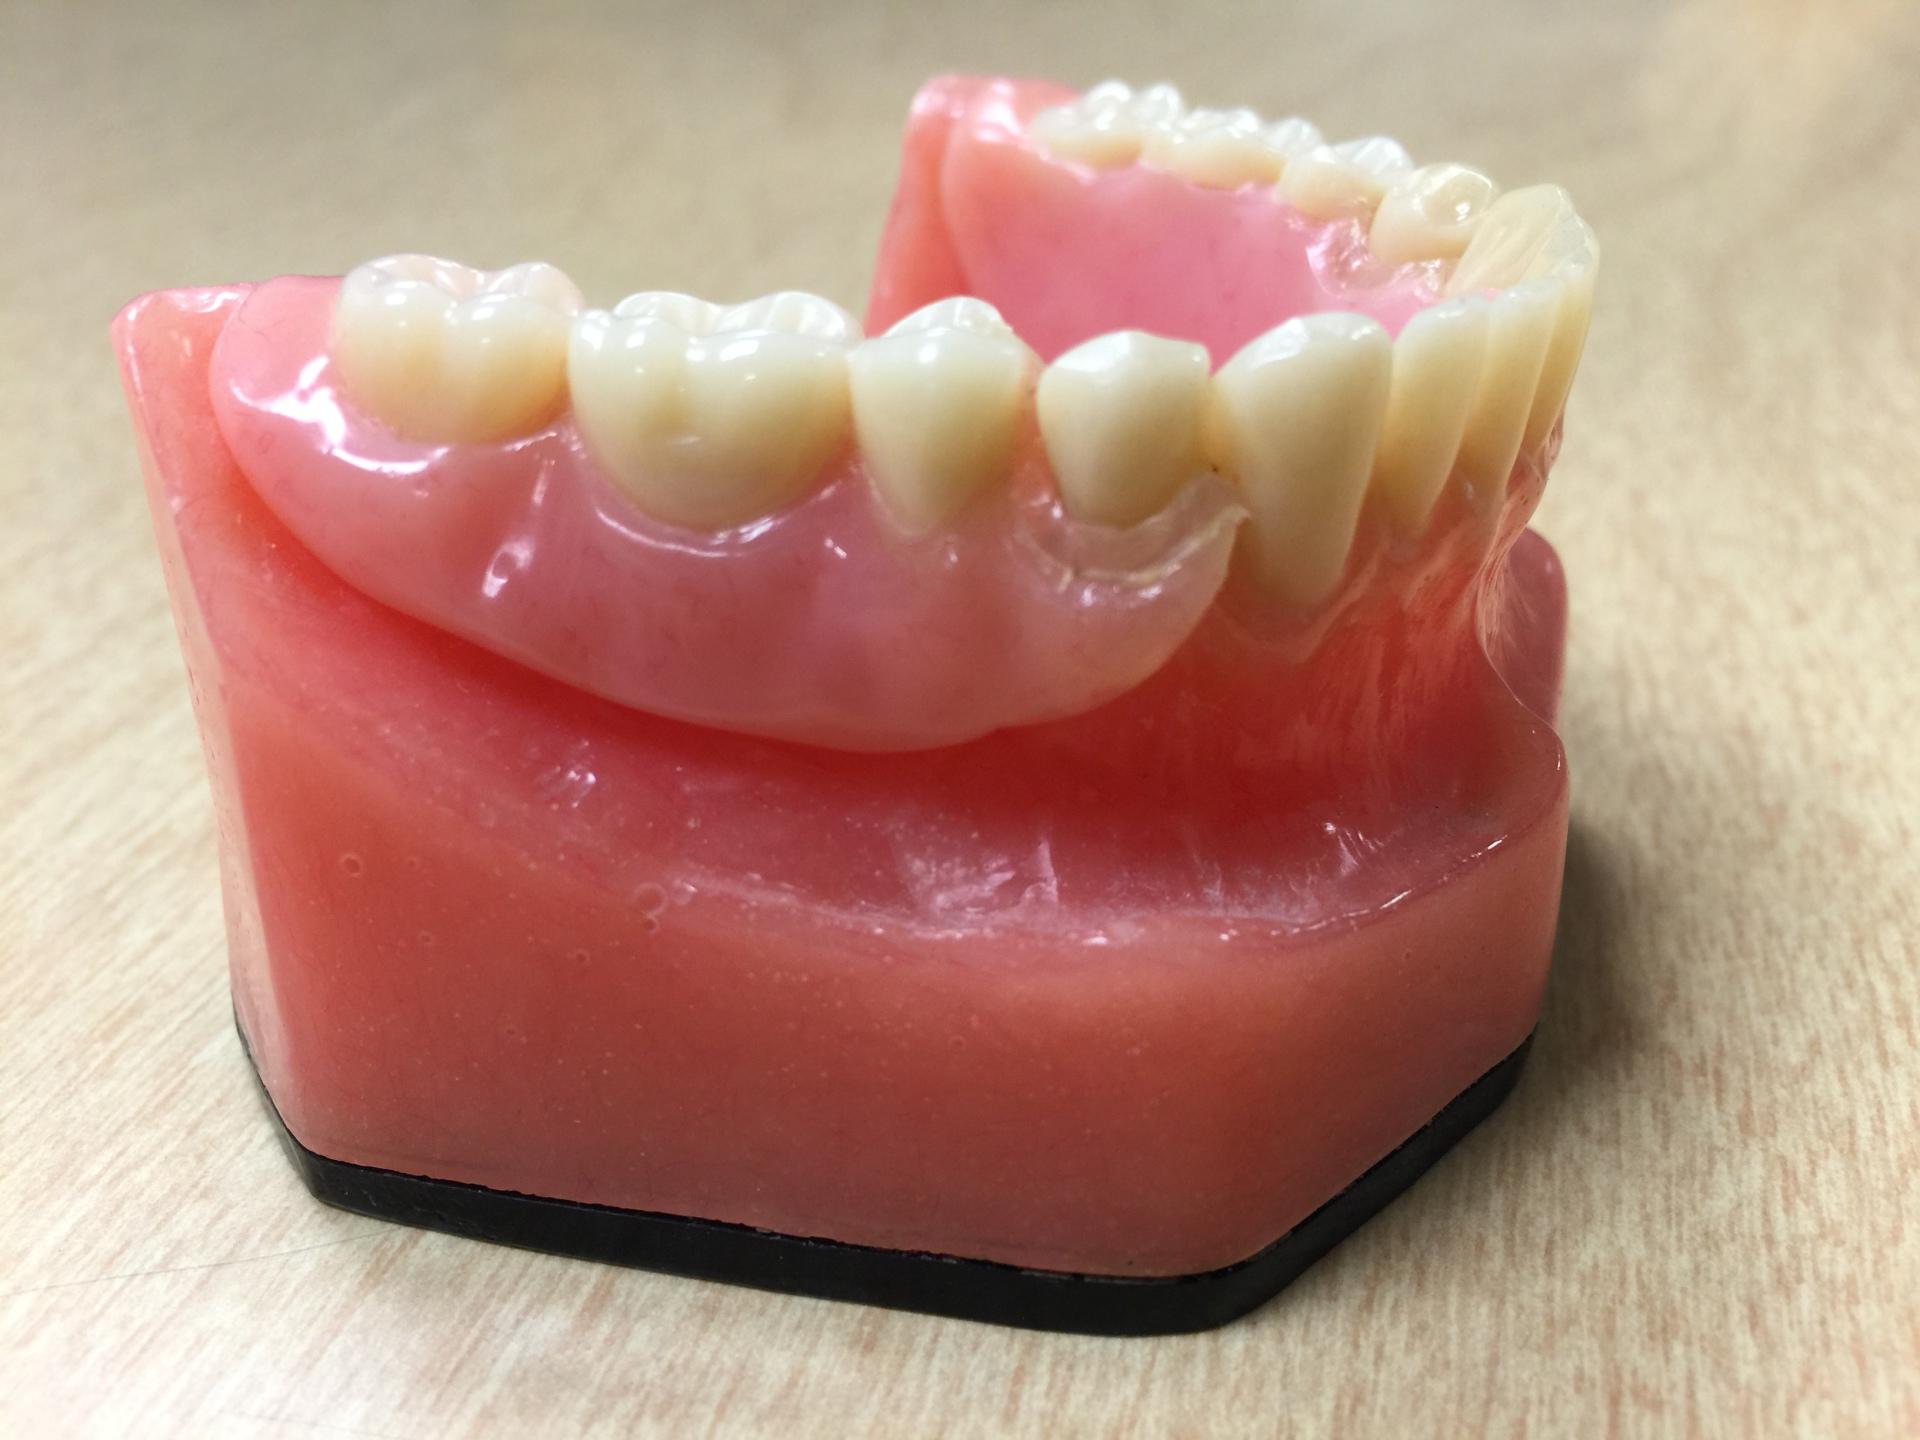 Photo of denture model